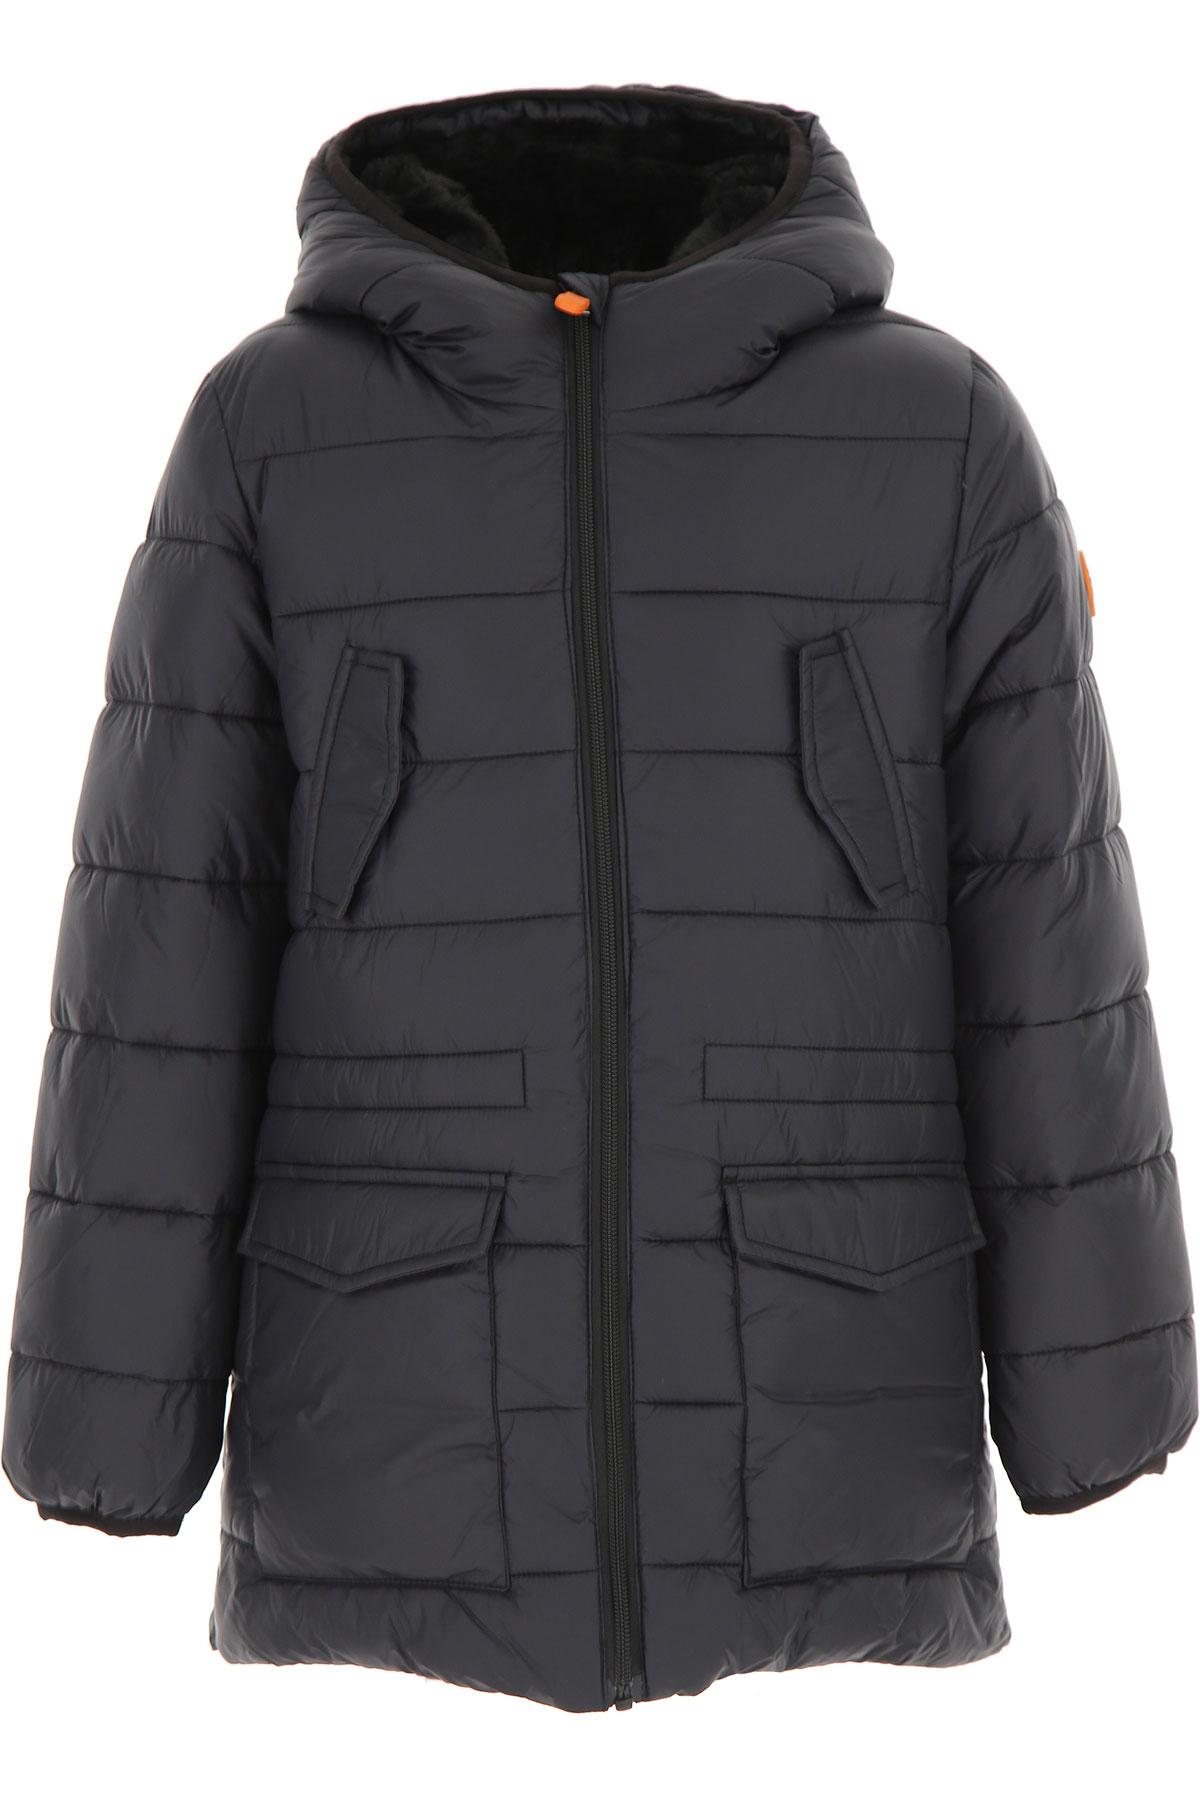 Image of Save the Duck Boys Down Jacket for Kids, Puffer Ski Jacket, Black, Nylon, 2017, 10Y 14Y 16Y 2Y 4Y 6Y 8Y